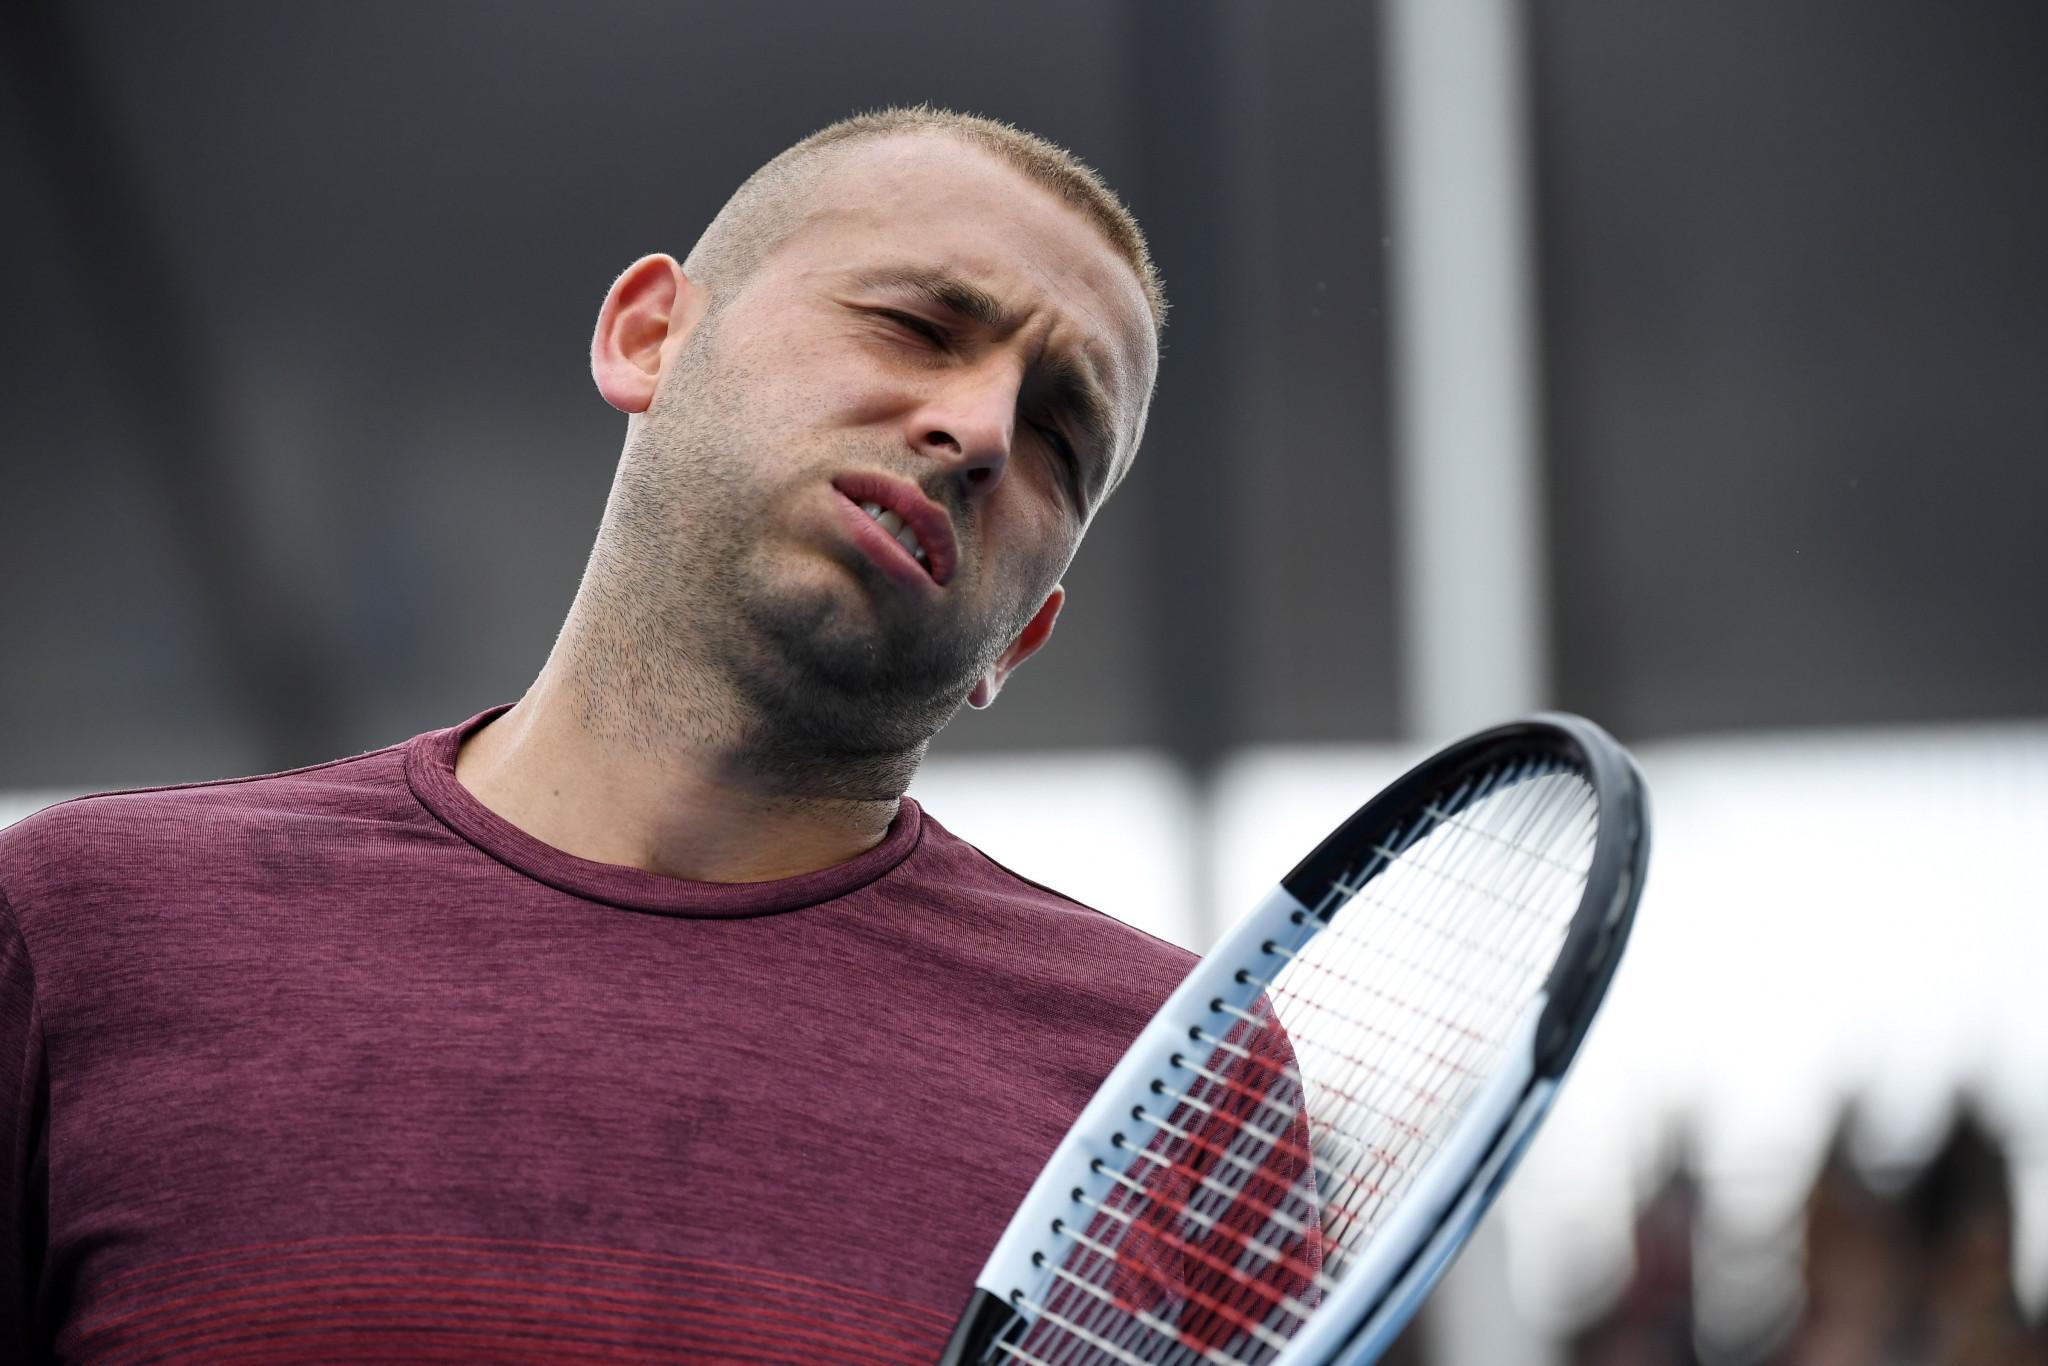 Evans set to skip Tokyo 2020 as Team GB face having no representative in men's tennis singles